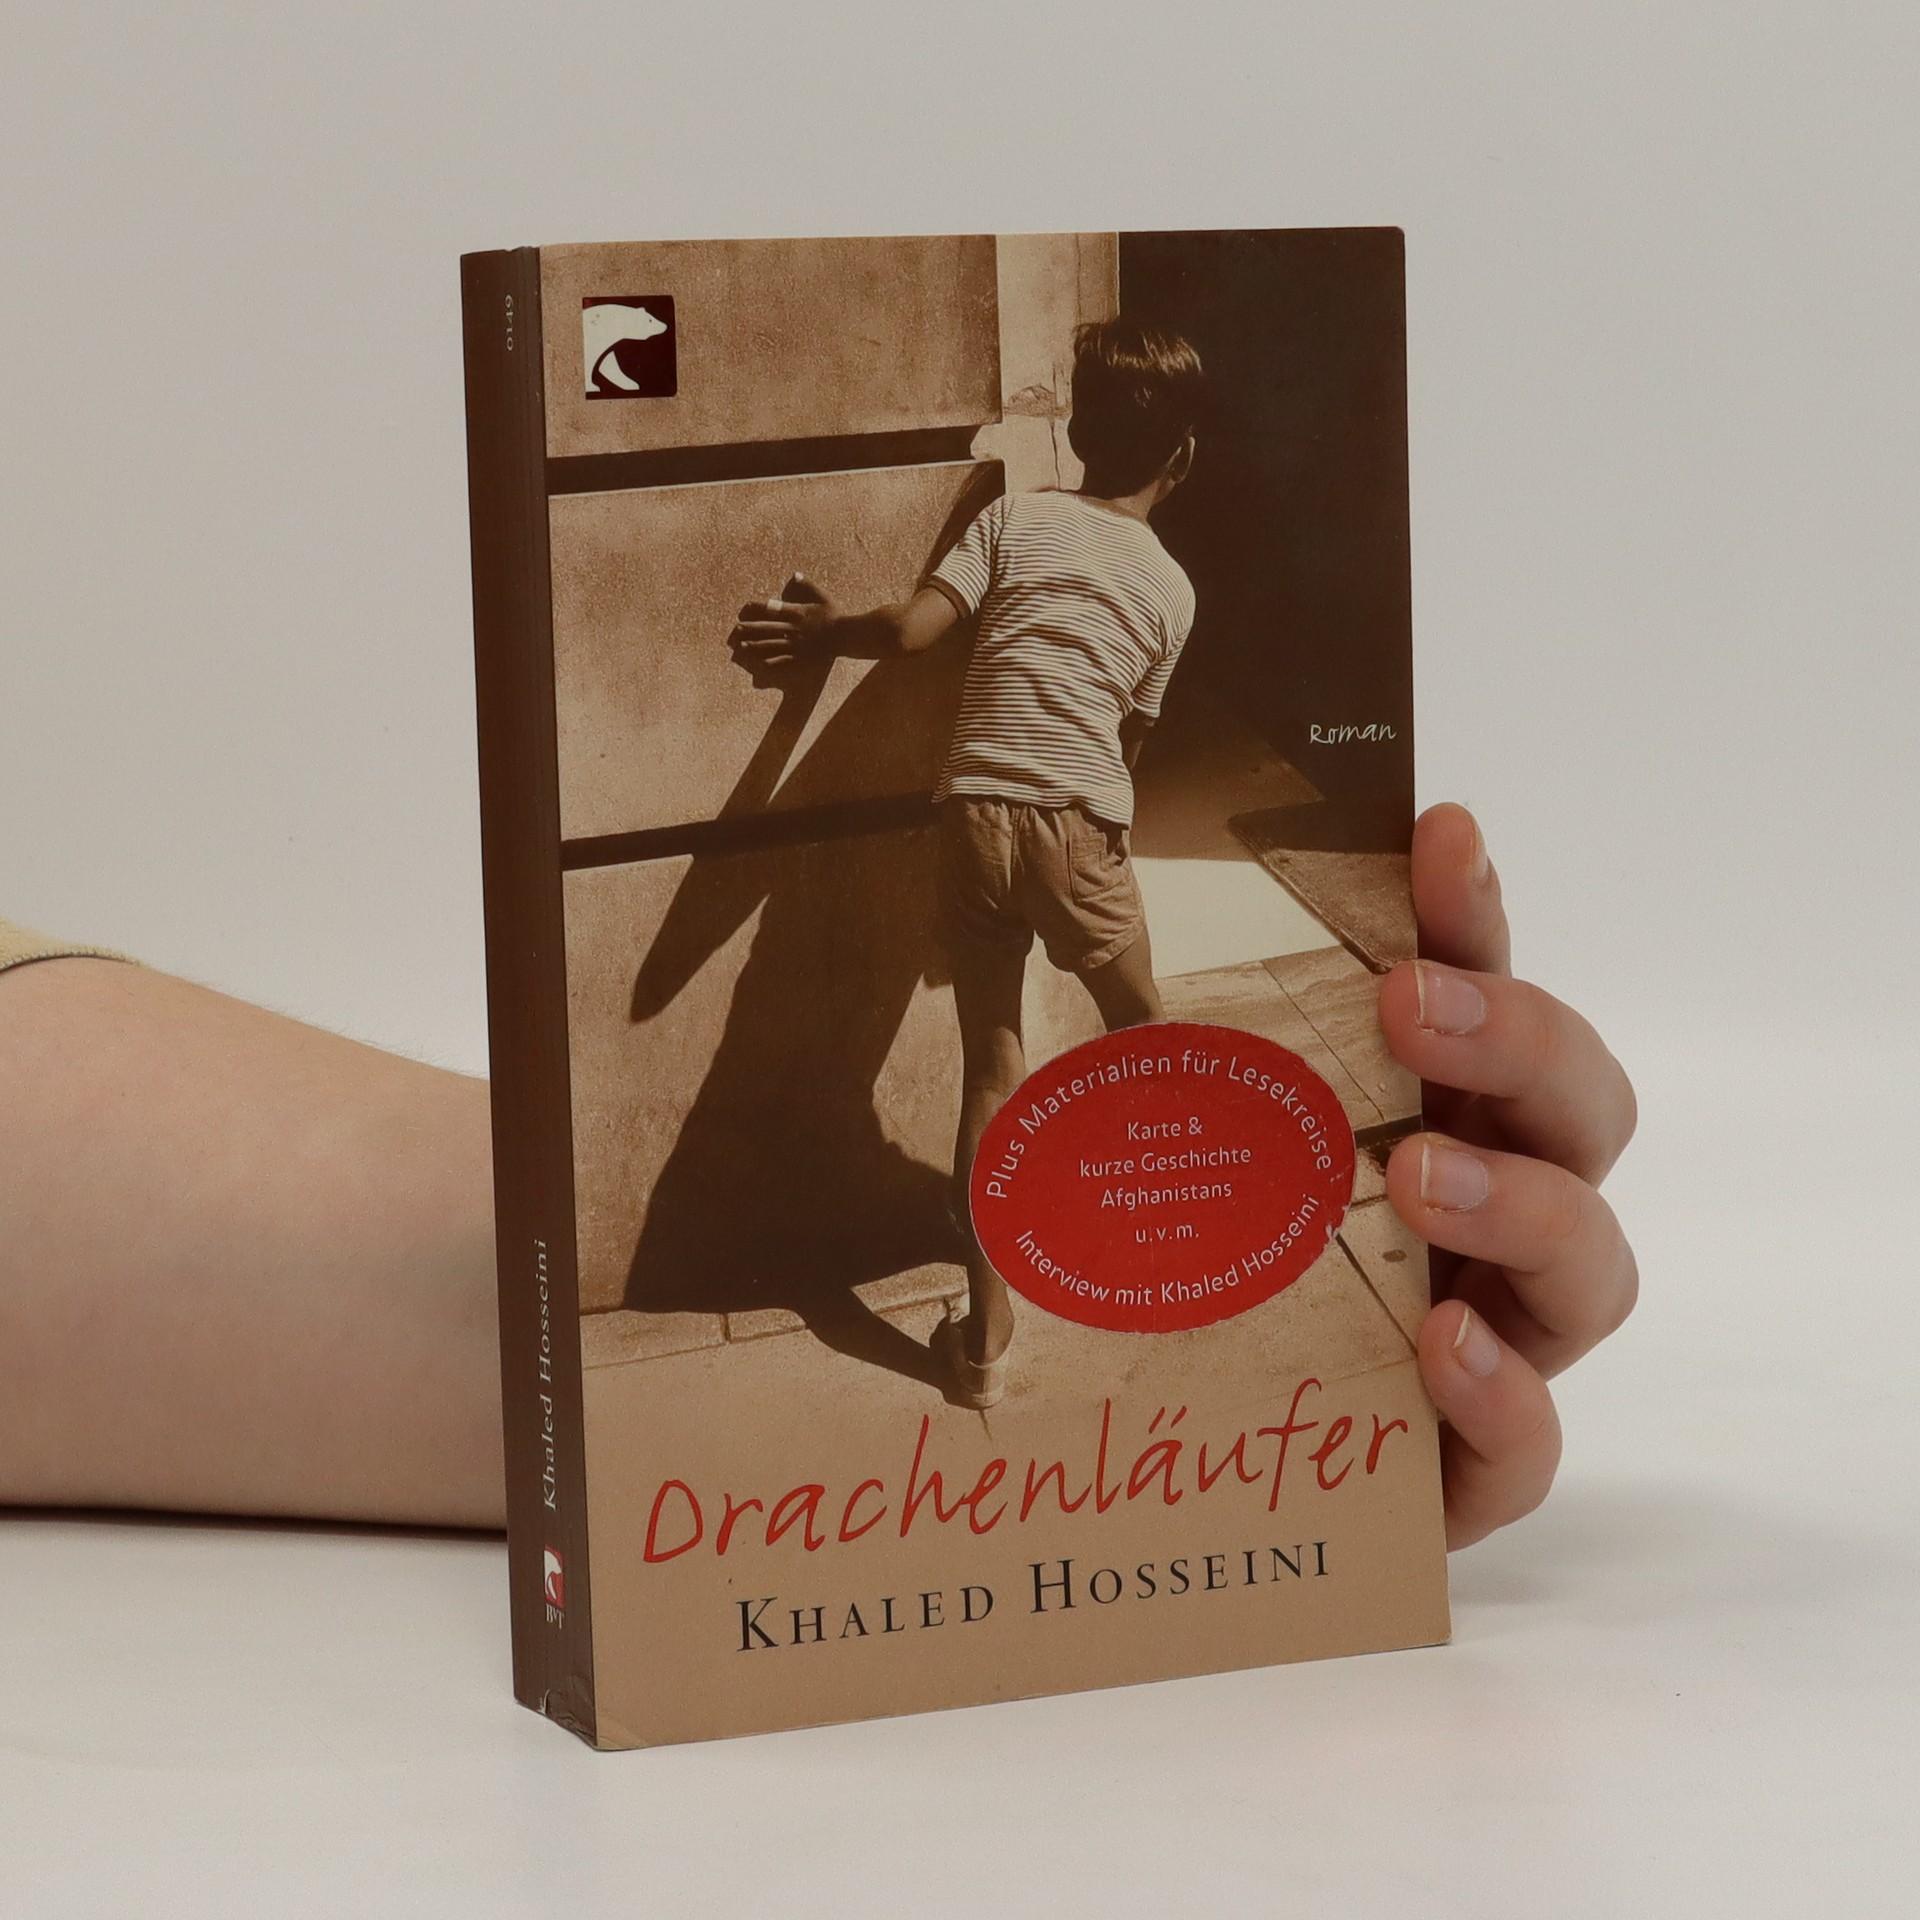 antikvární kniha Drachenläufer, 2007